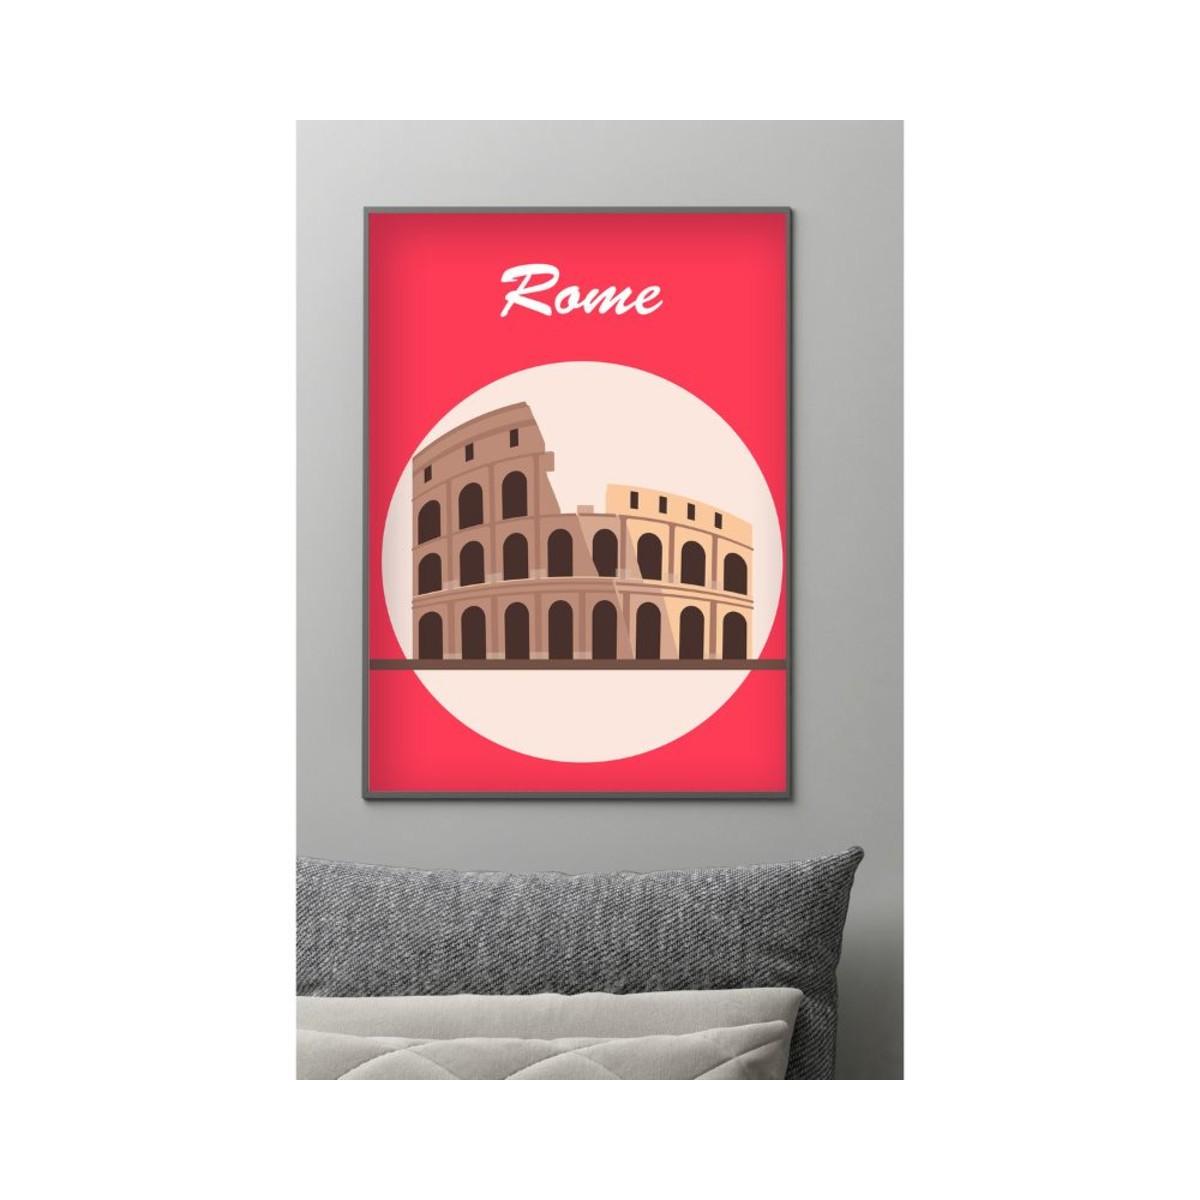 Постер в раме ПростоПостер Колизей 242324873874 50х70 см